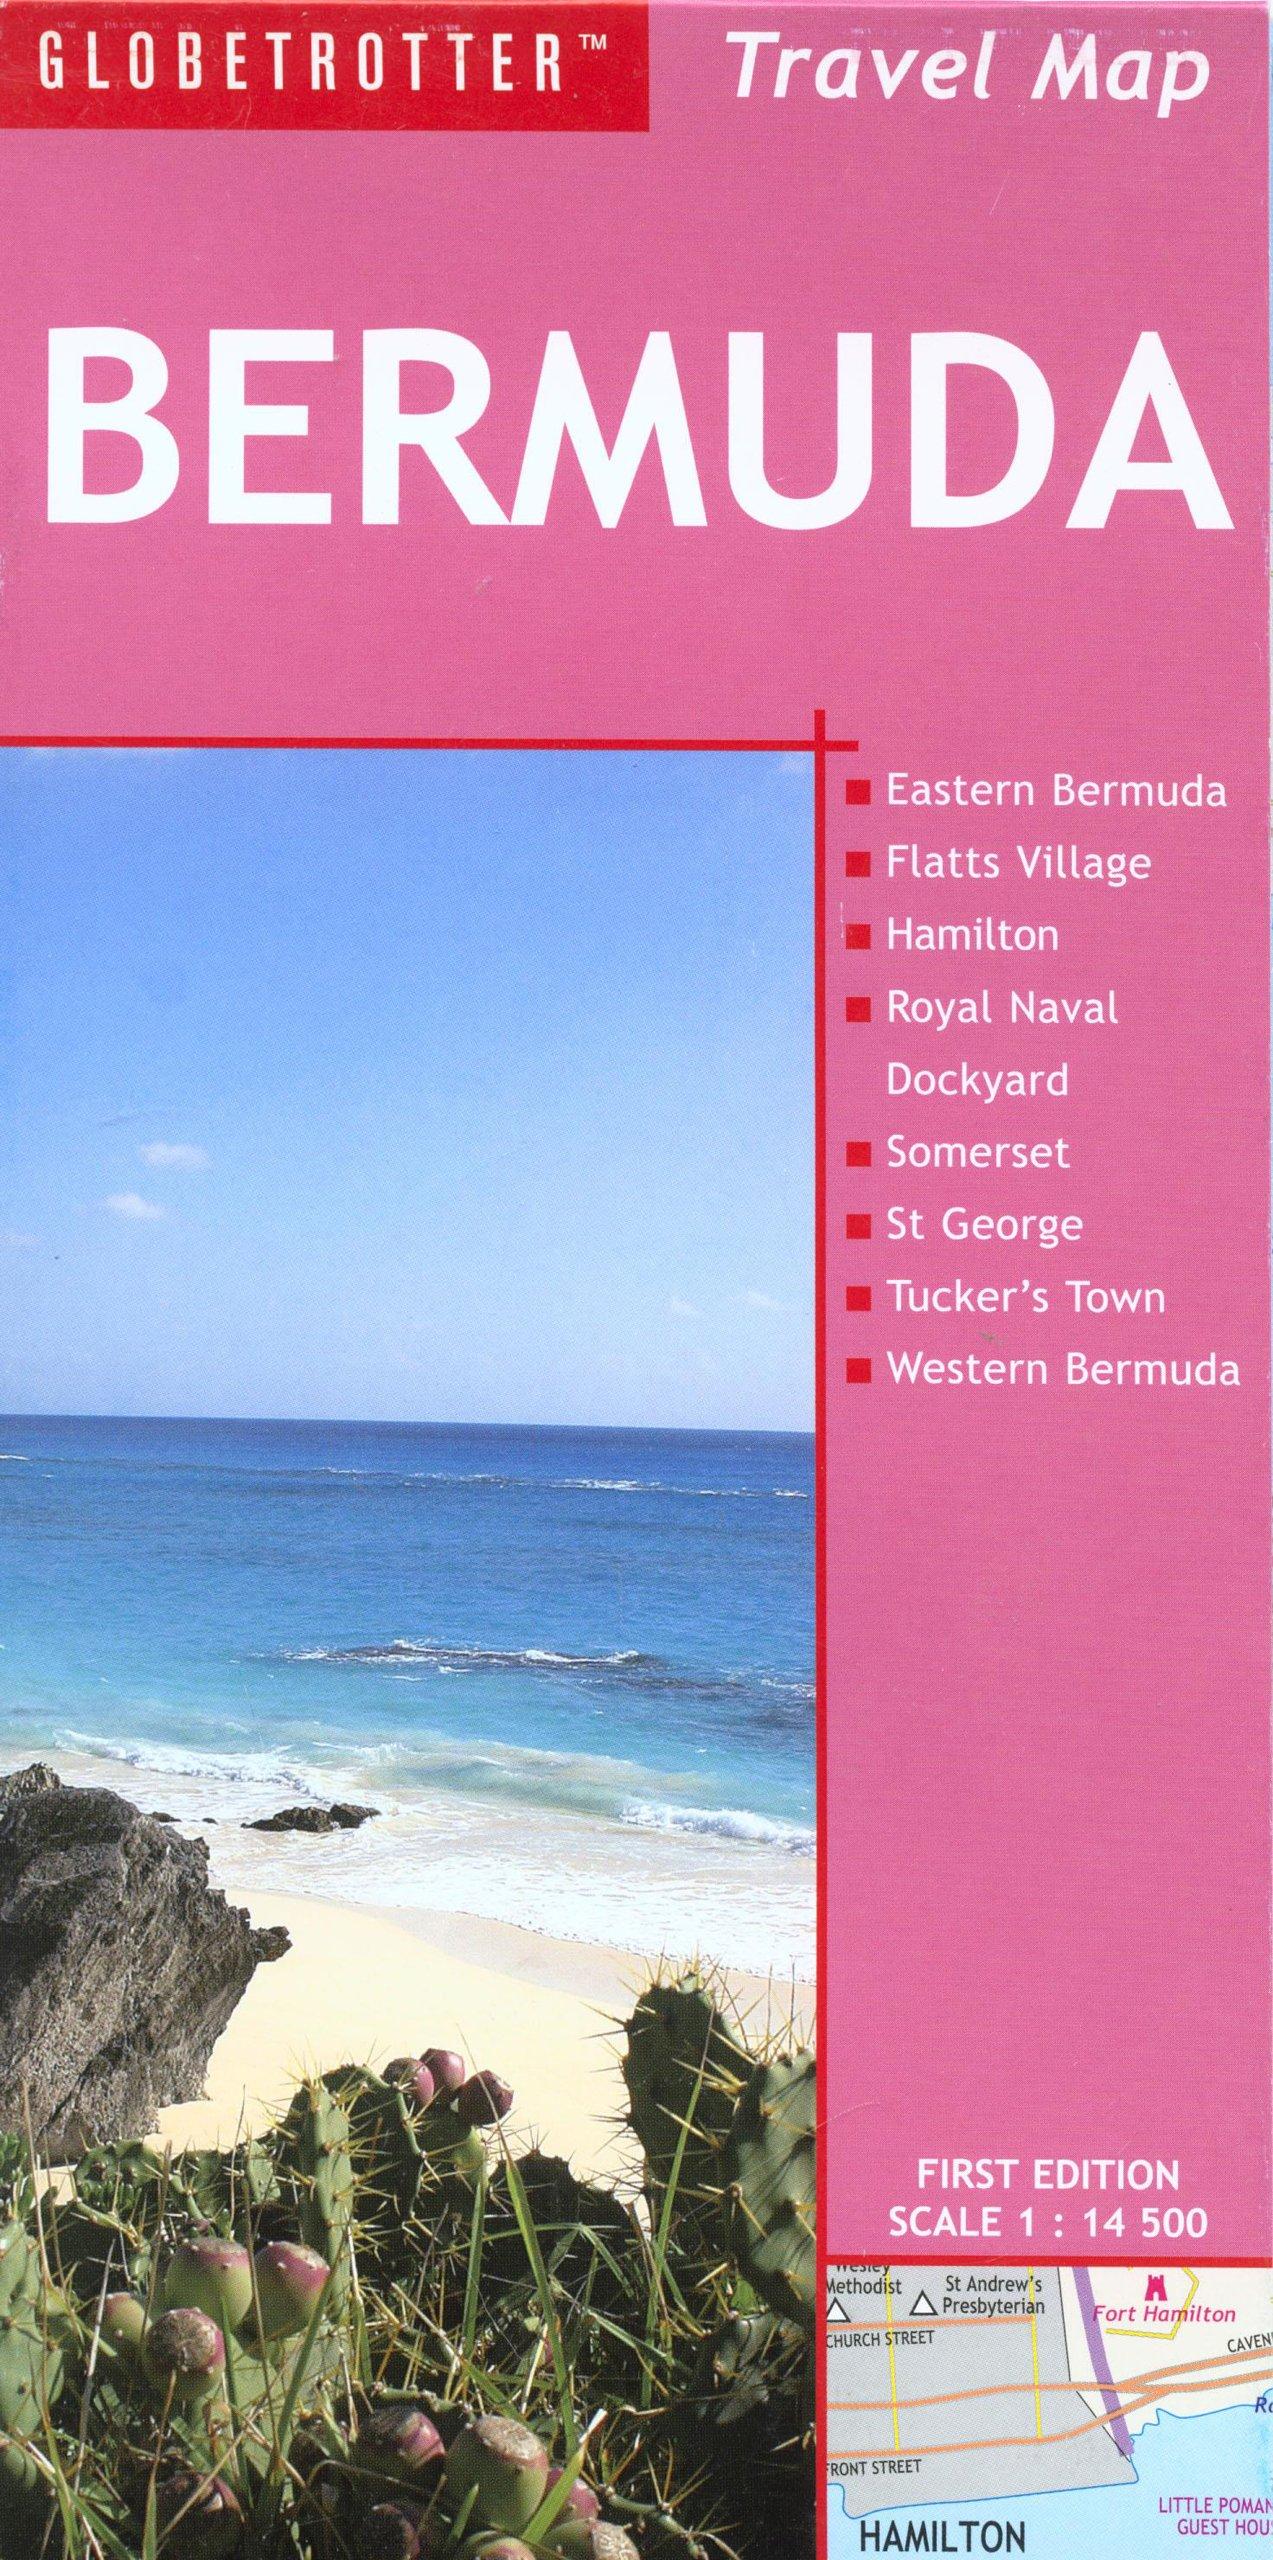 Travel Amazon ca Bermuda MapGlobetrotter9781845374532Books hQtsrd